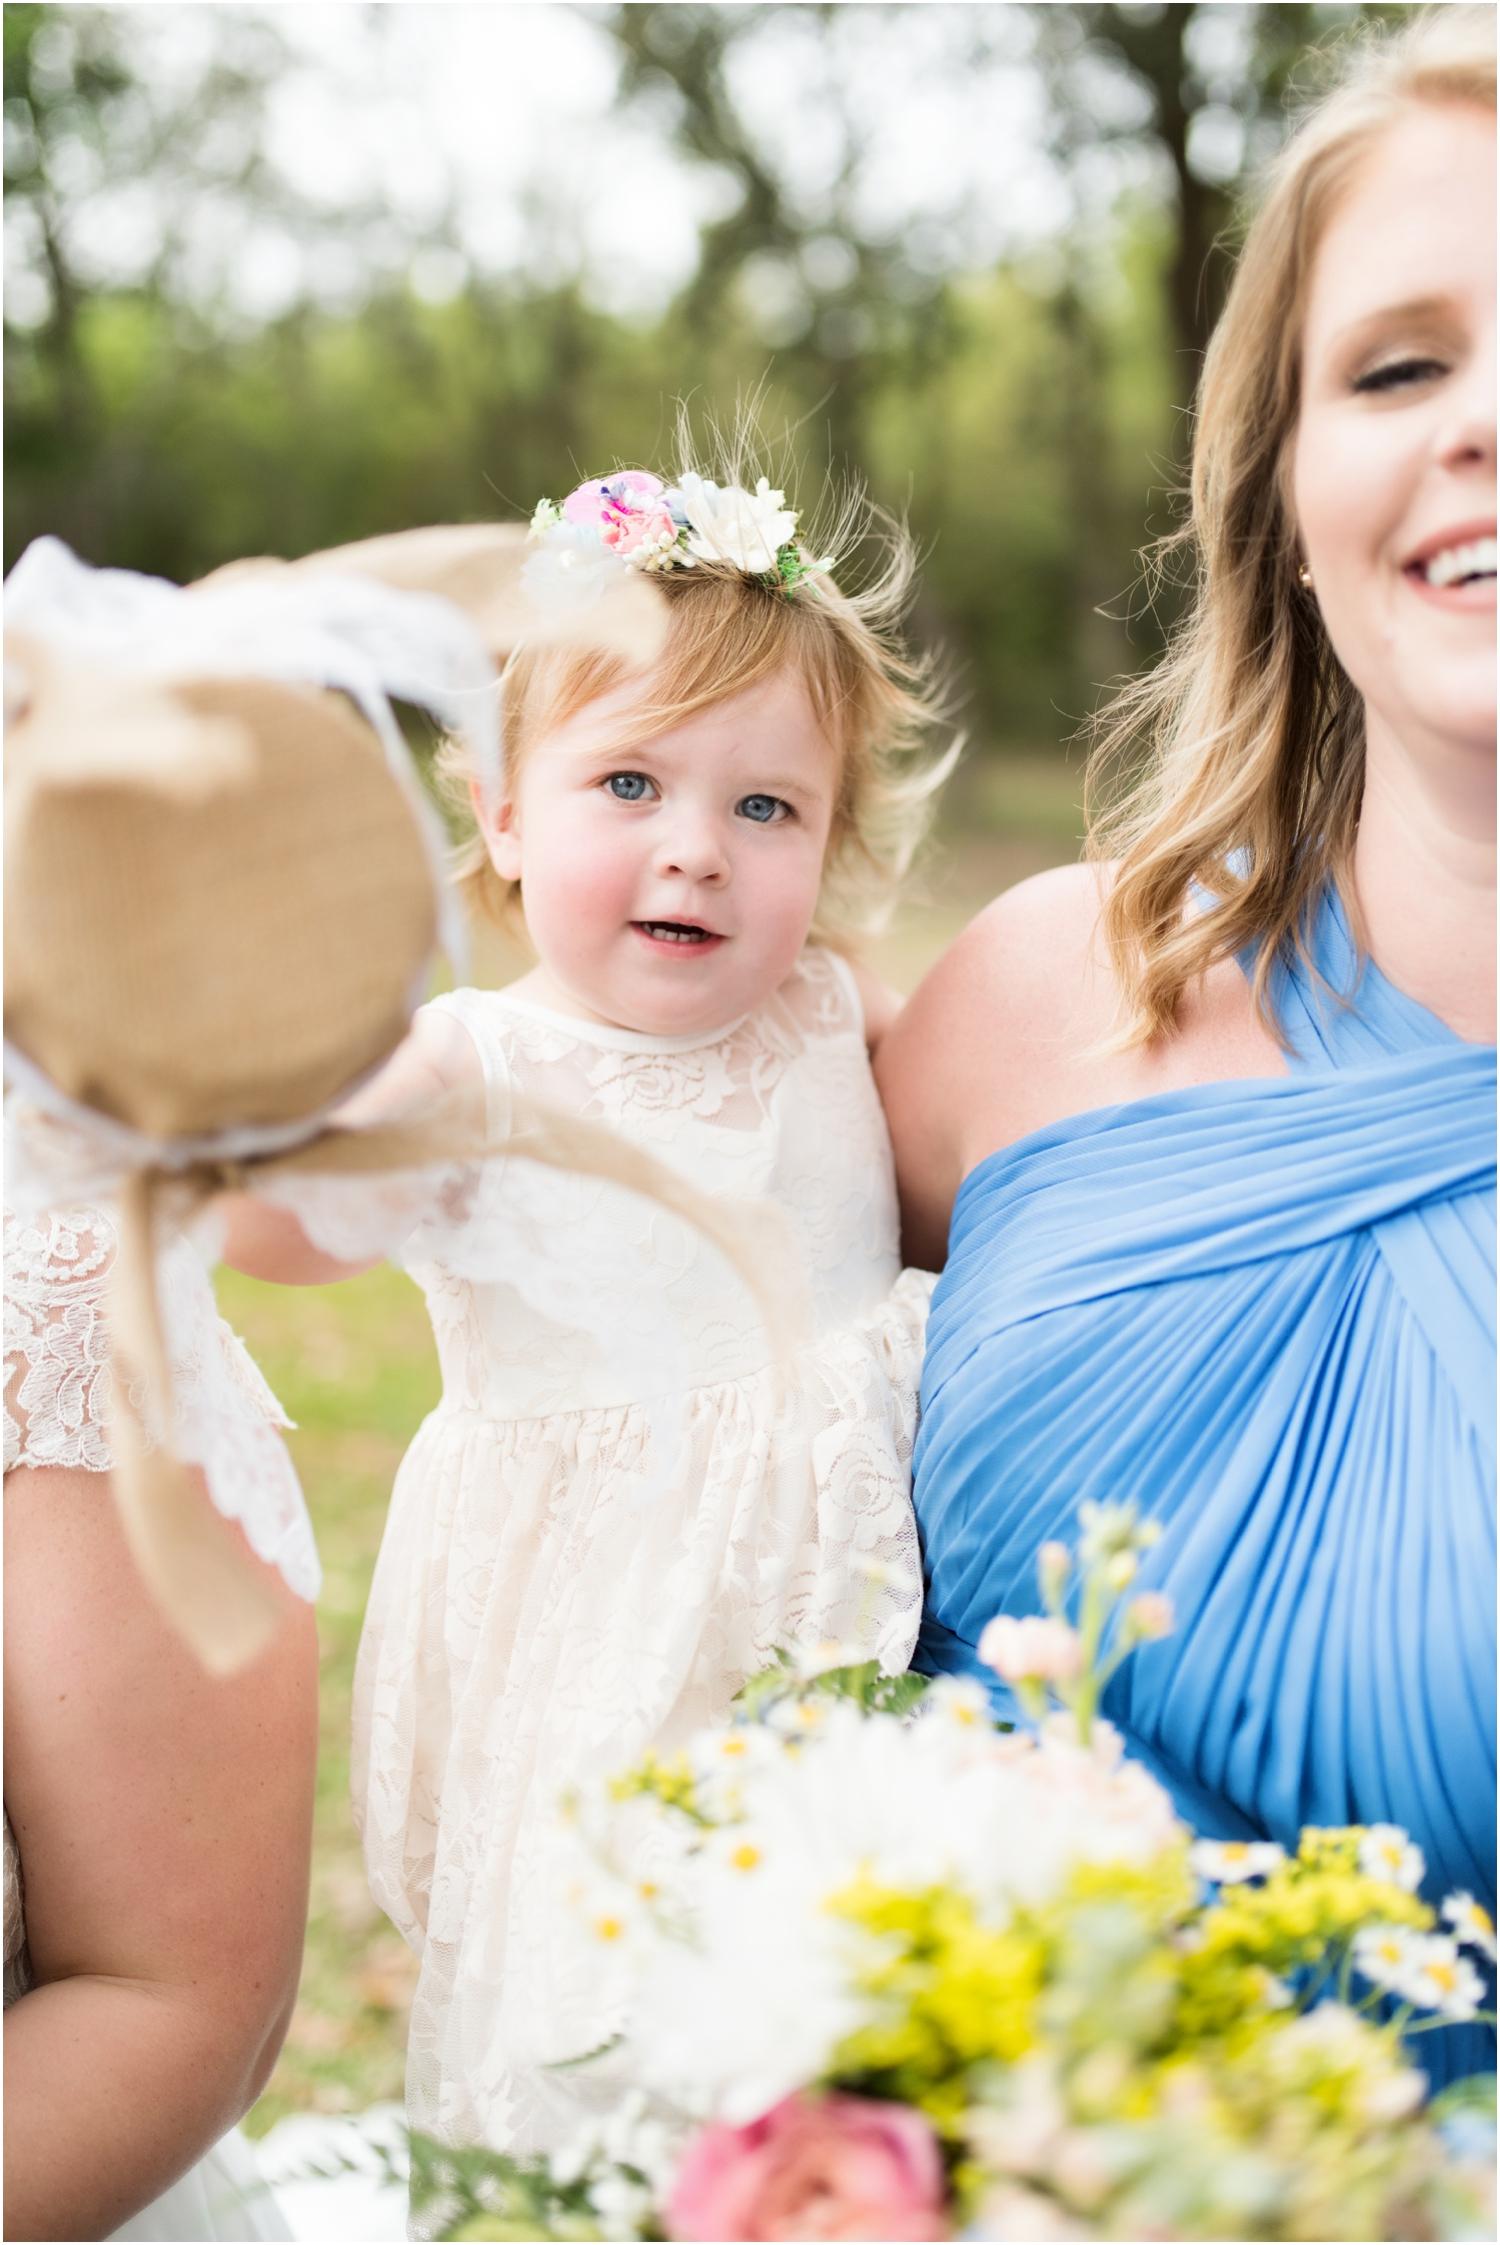 Sowell Farms Milton Florida Rustic Woodsy Barn Wedding Photographer bridesmaids bride bridal party